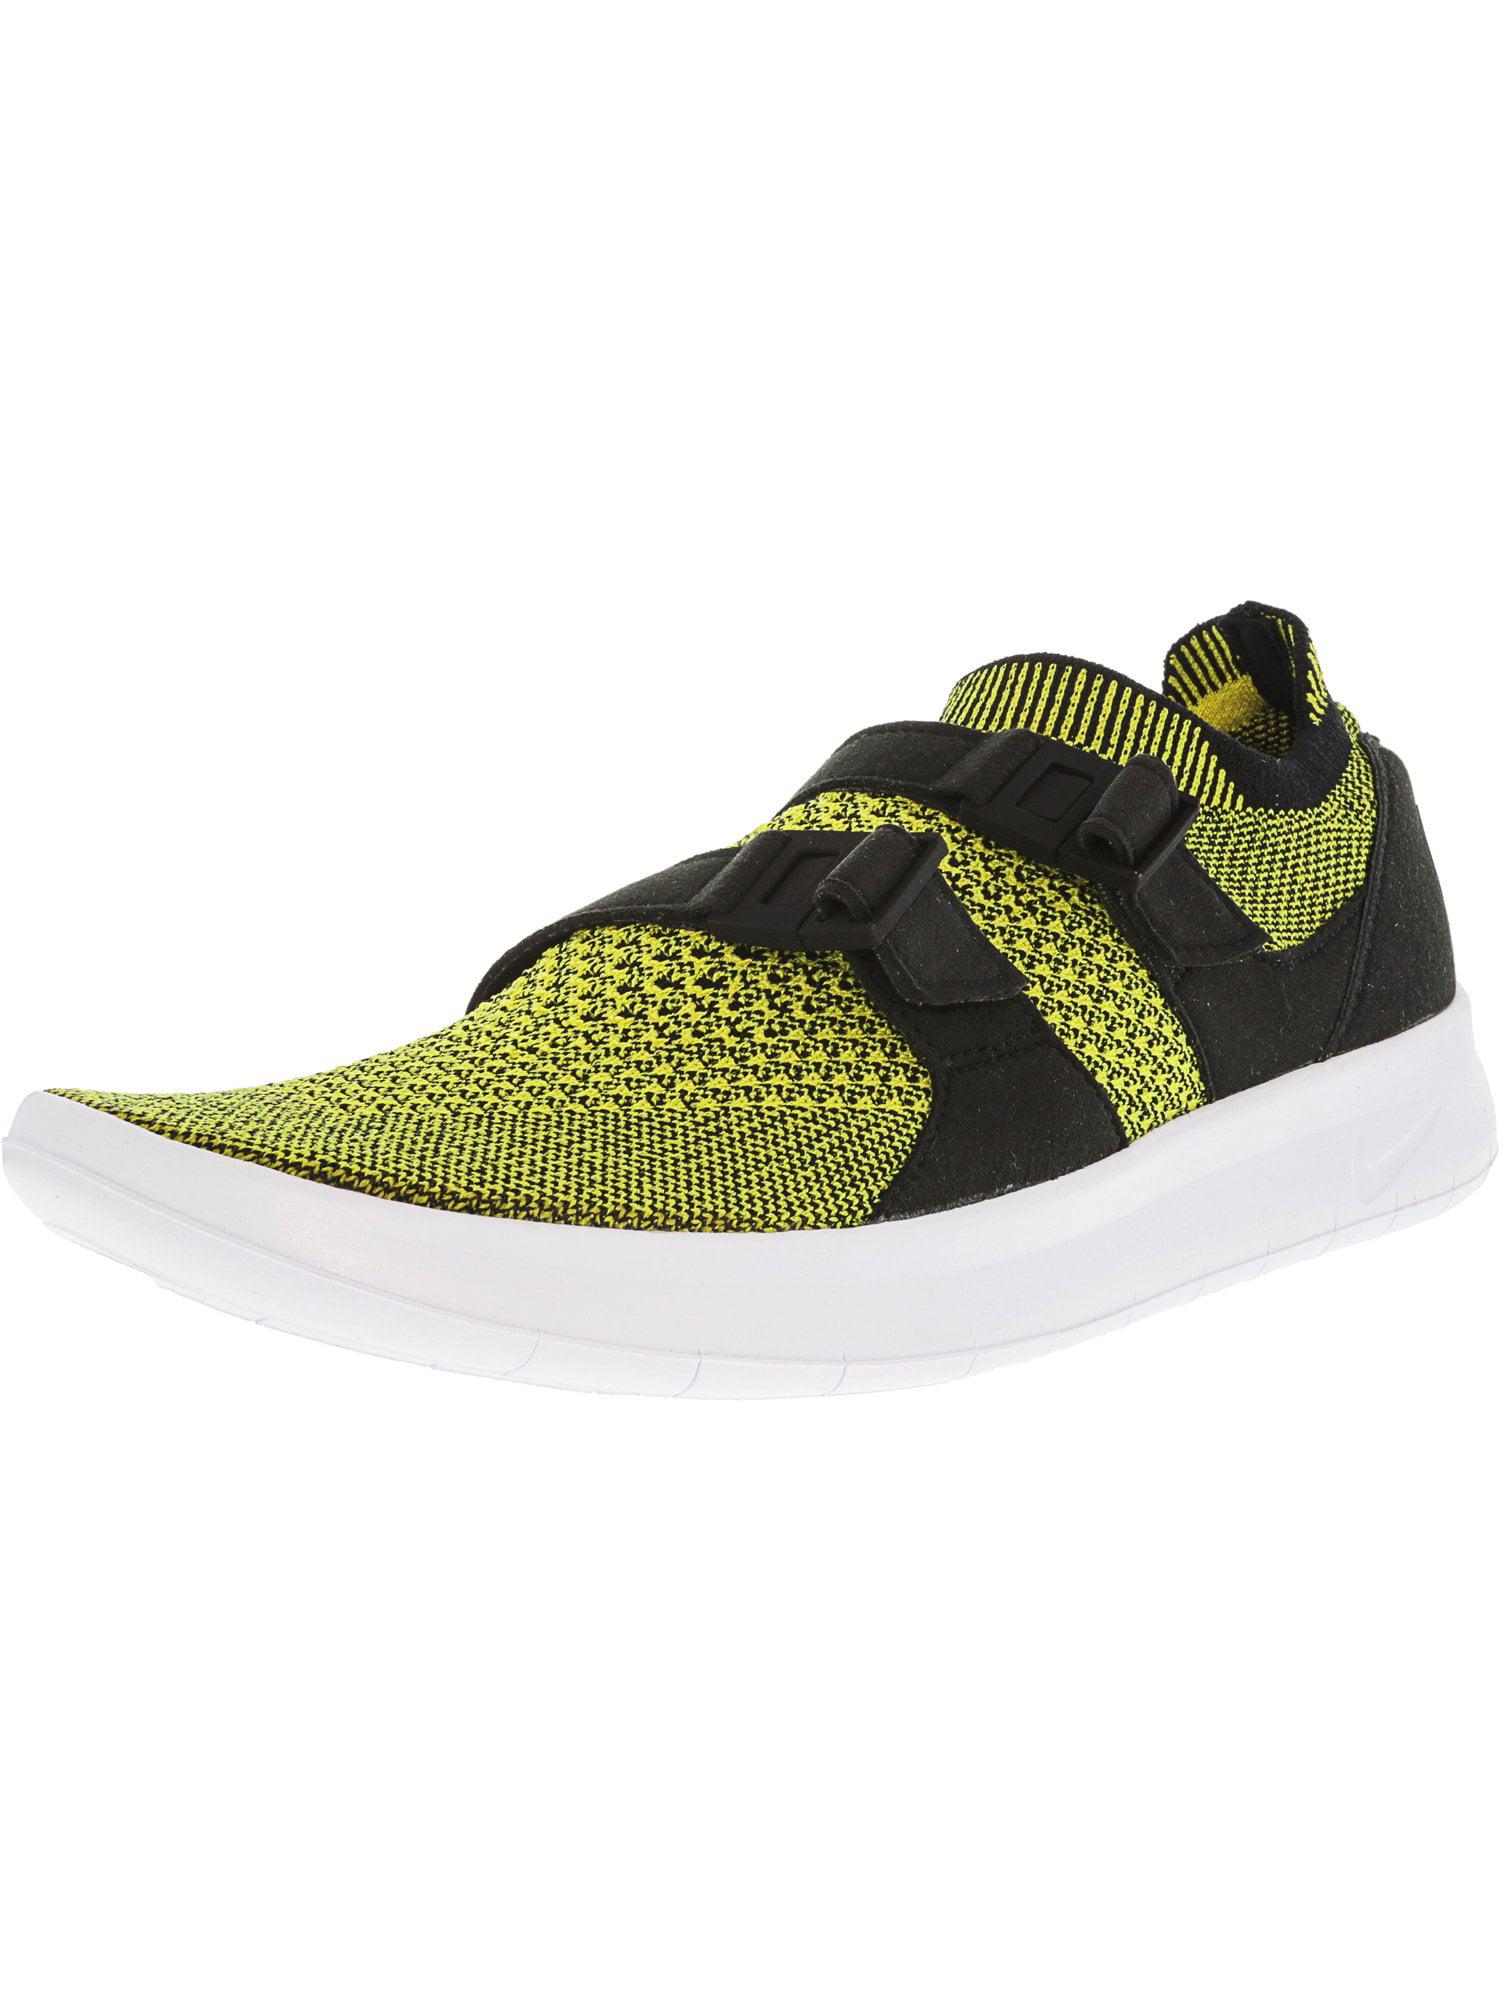 6a044bec6d0e Nike Women s Air Sockracer Flyknit Black   White Yellow Strike Ankle-High  Running Shoe - 7M